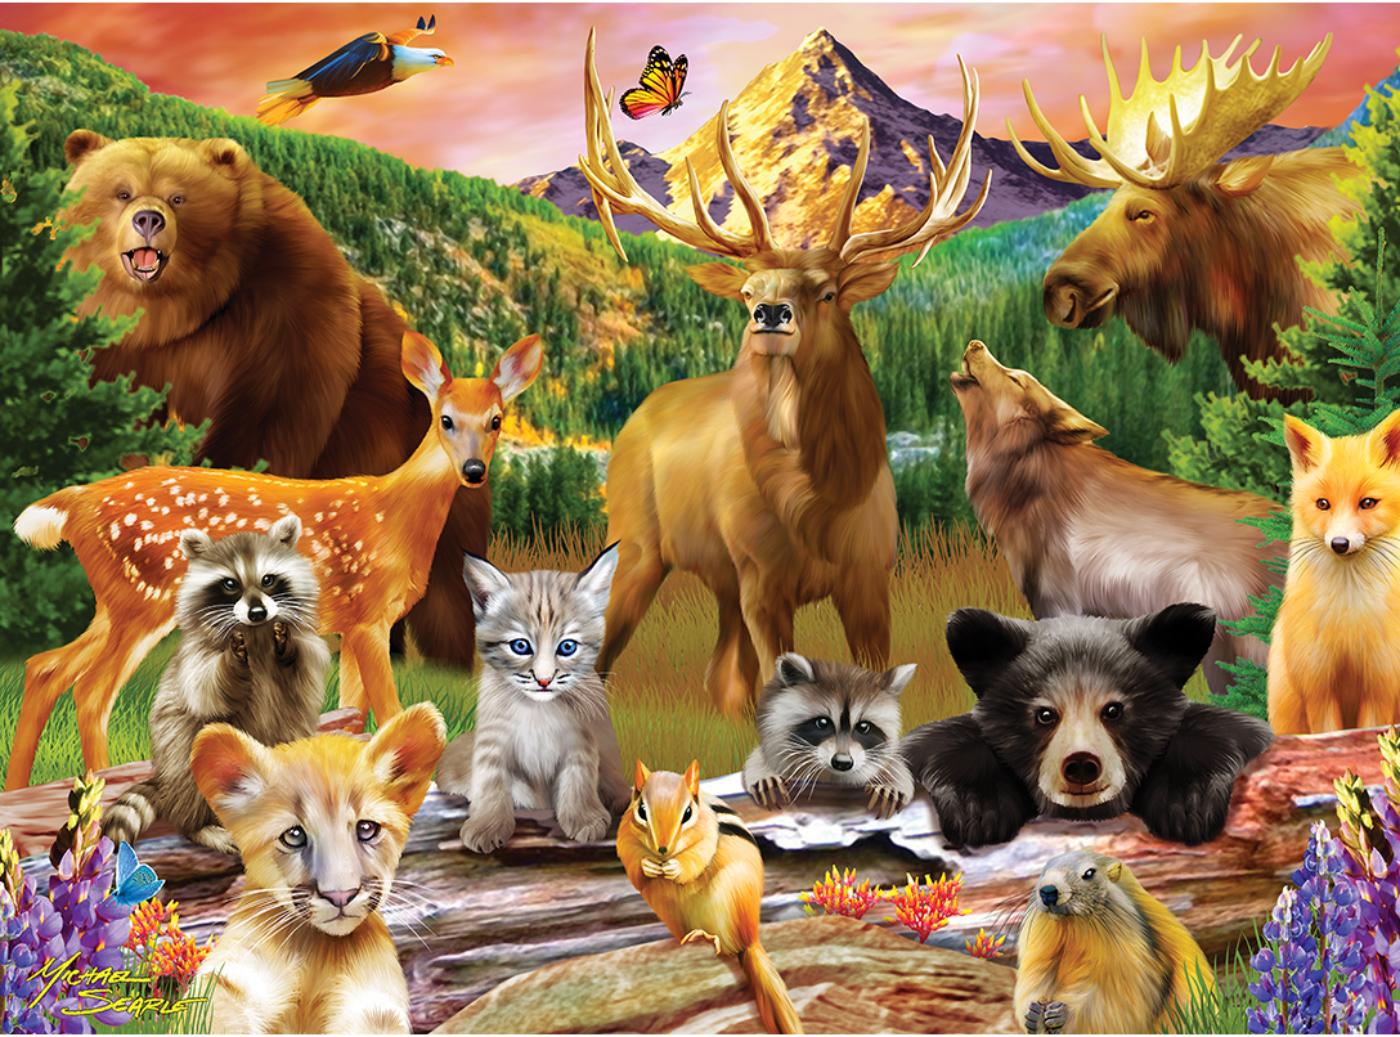 Wildlife of the National Parks Wildlife Jigsaw Puzzle